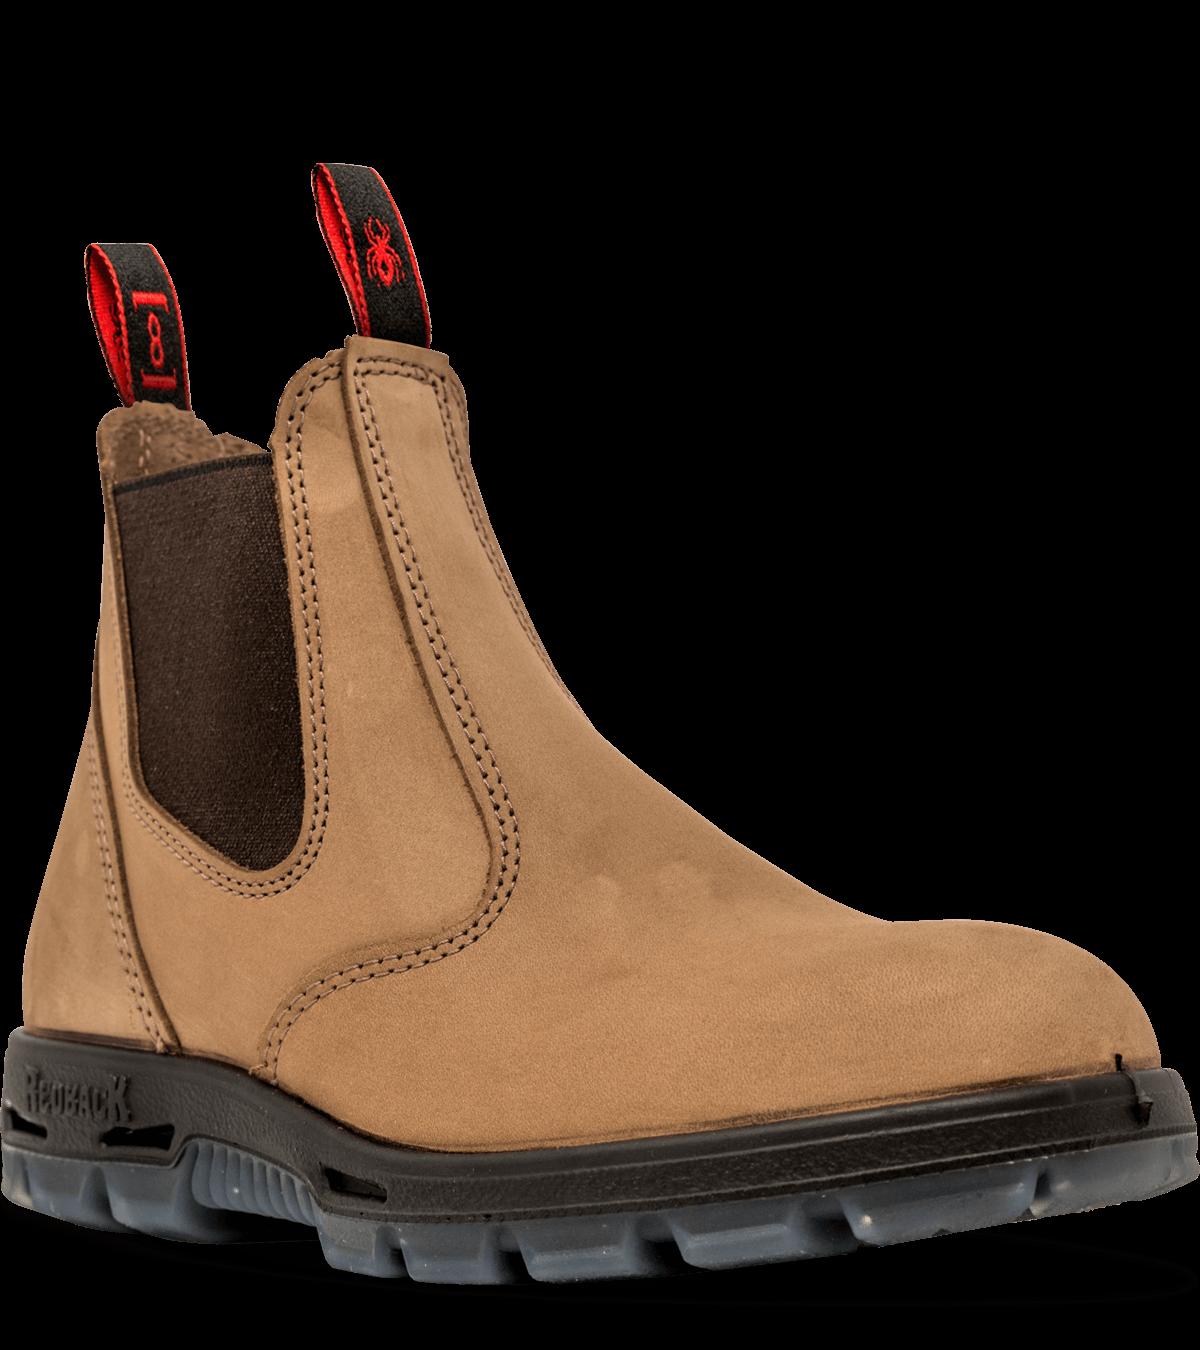 Mesa Redback Boots Redback Boots Boots Boots Men